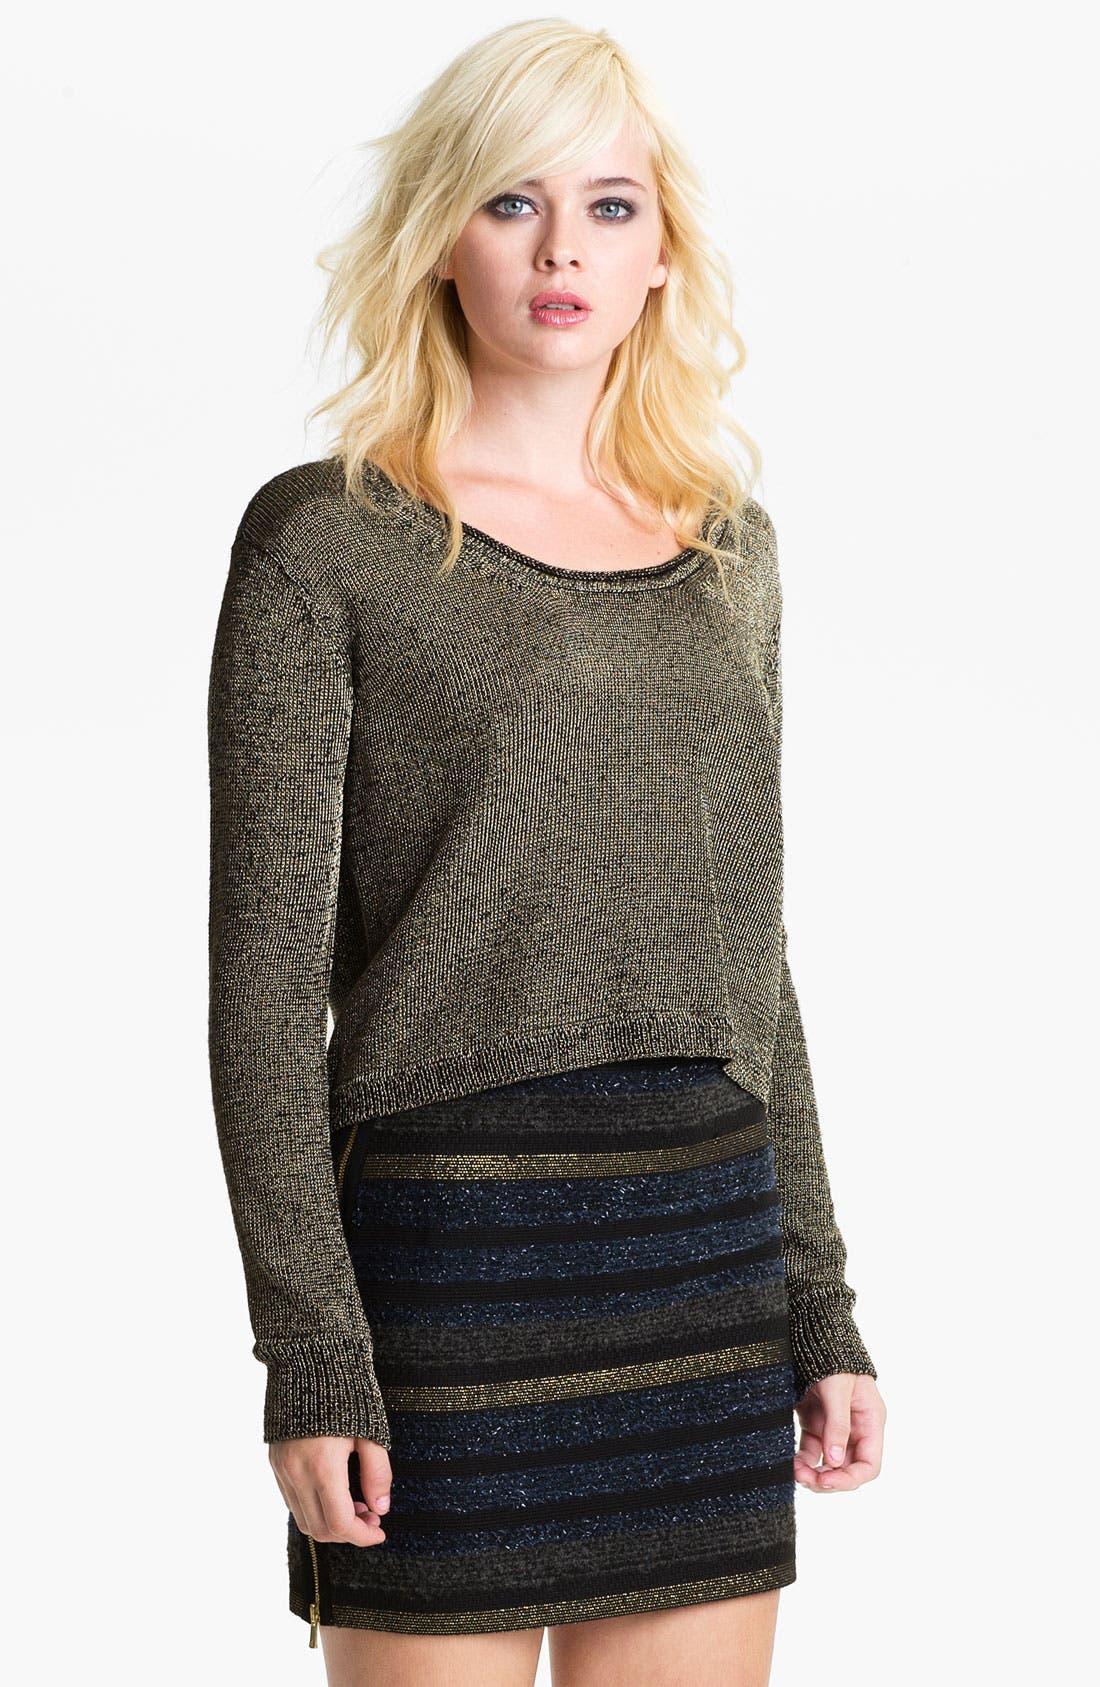 Main Image - Rebecca Minkoff 'Ellen' Metallic Sweater